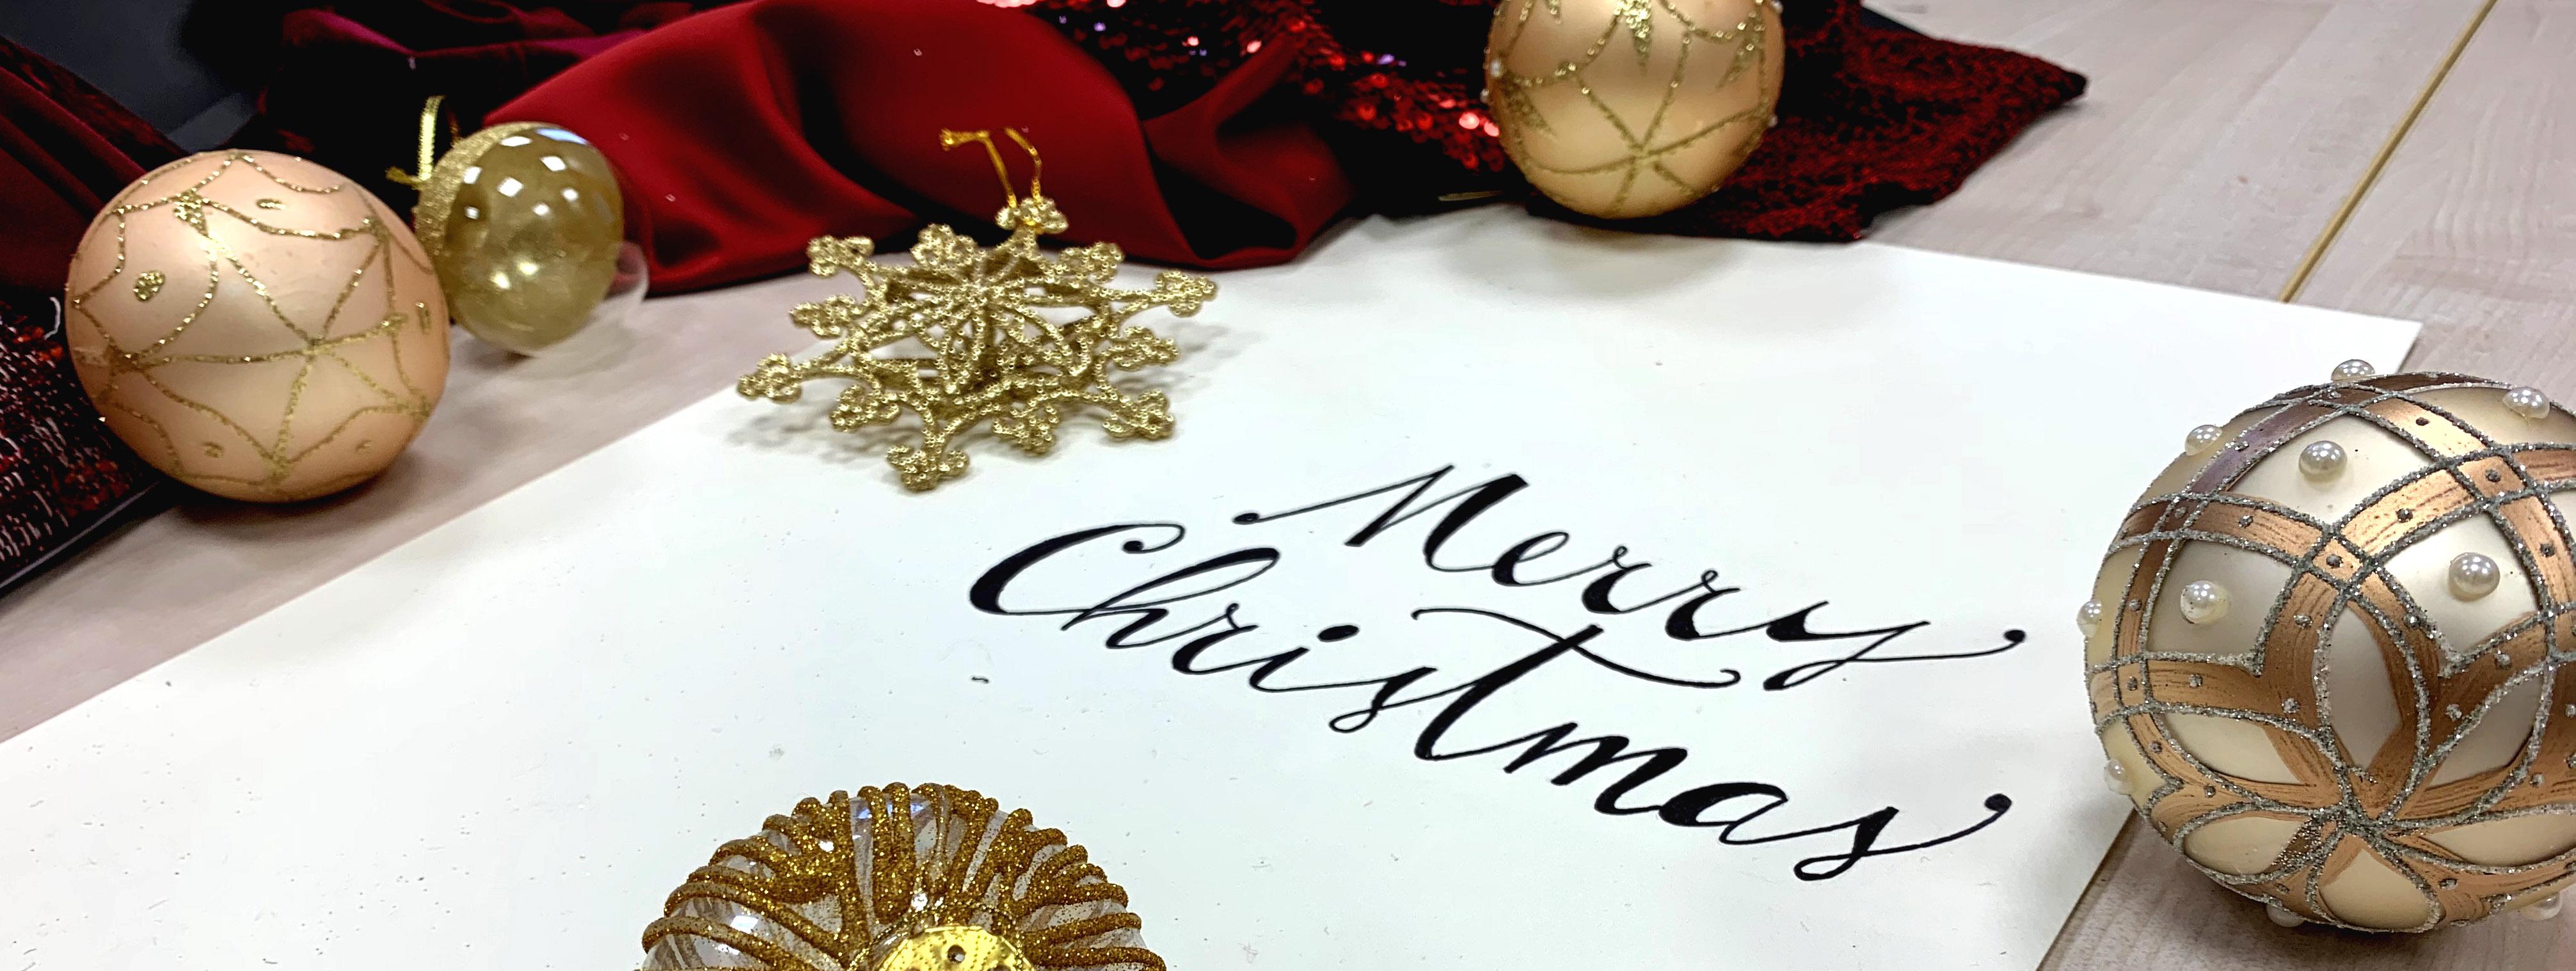 Team Intesa augura buon Natale!